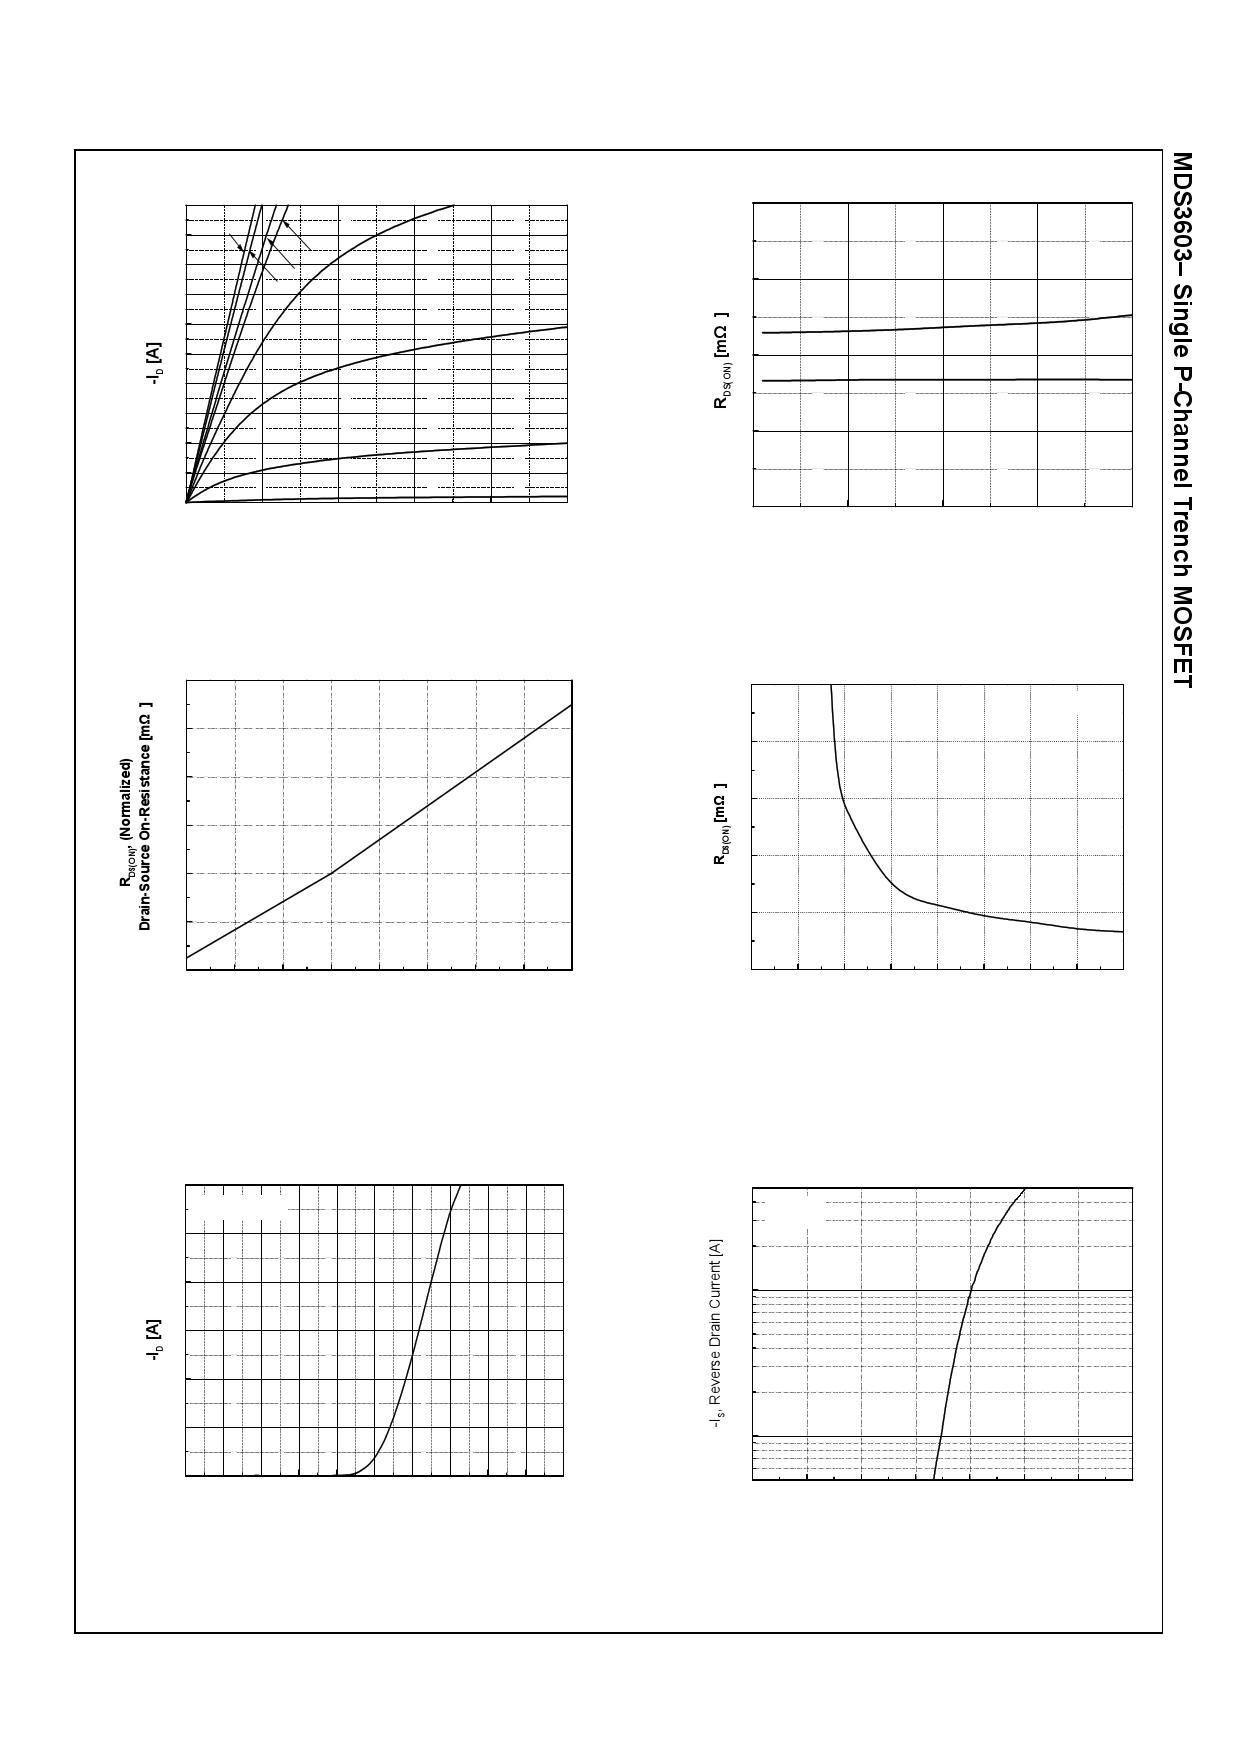 MDS3603 pdf, ピン配列